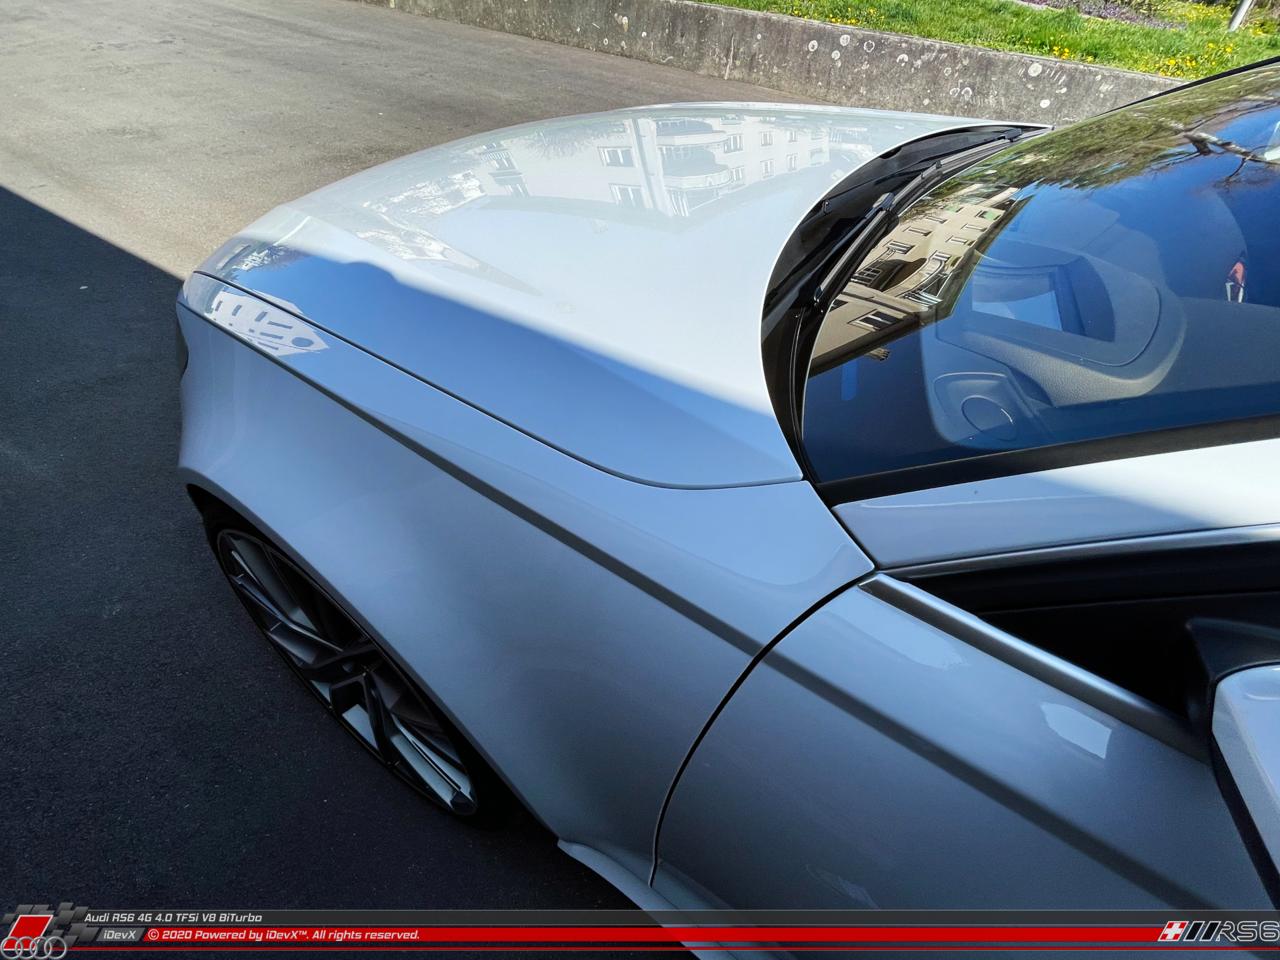 03.04.2021_Audi-RS6_iDevX_008.png